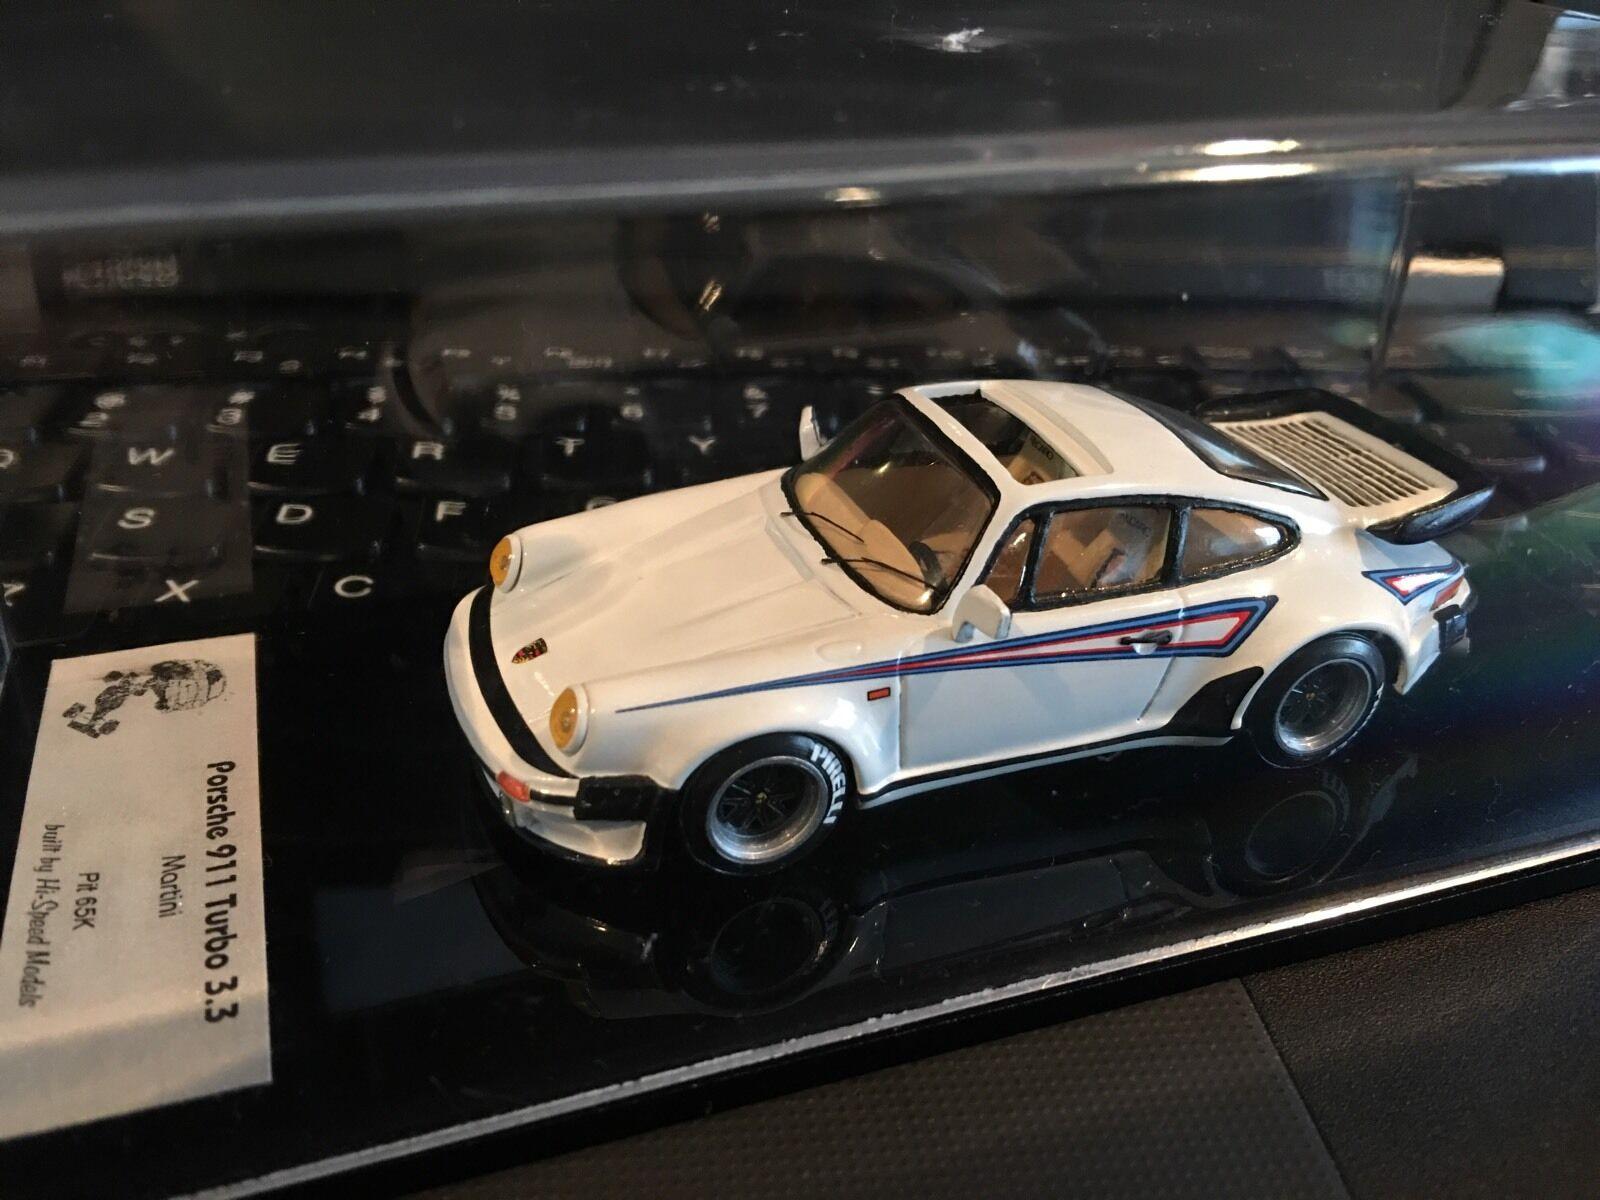 1 43 AMR type PORSCHE 911 TURBO 3.3 MARTINI LE n BBR LOOKSMART-RARE